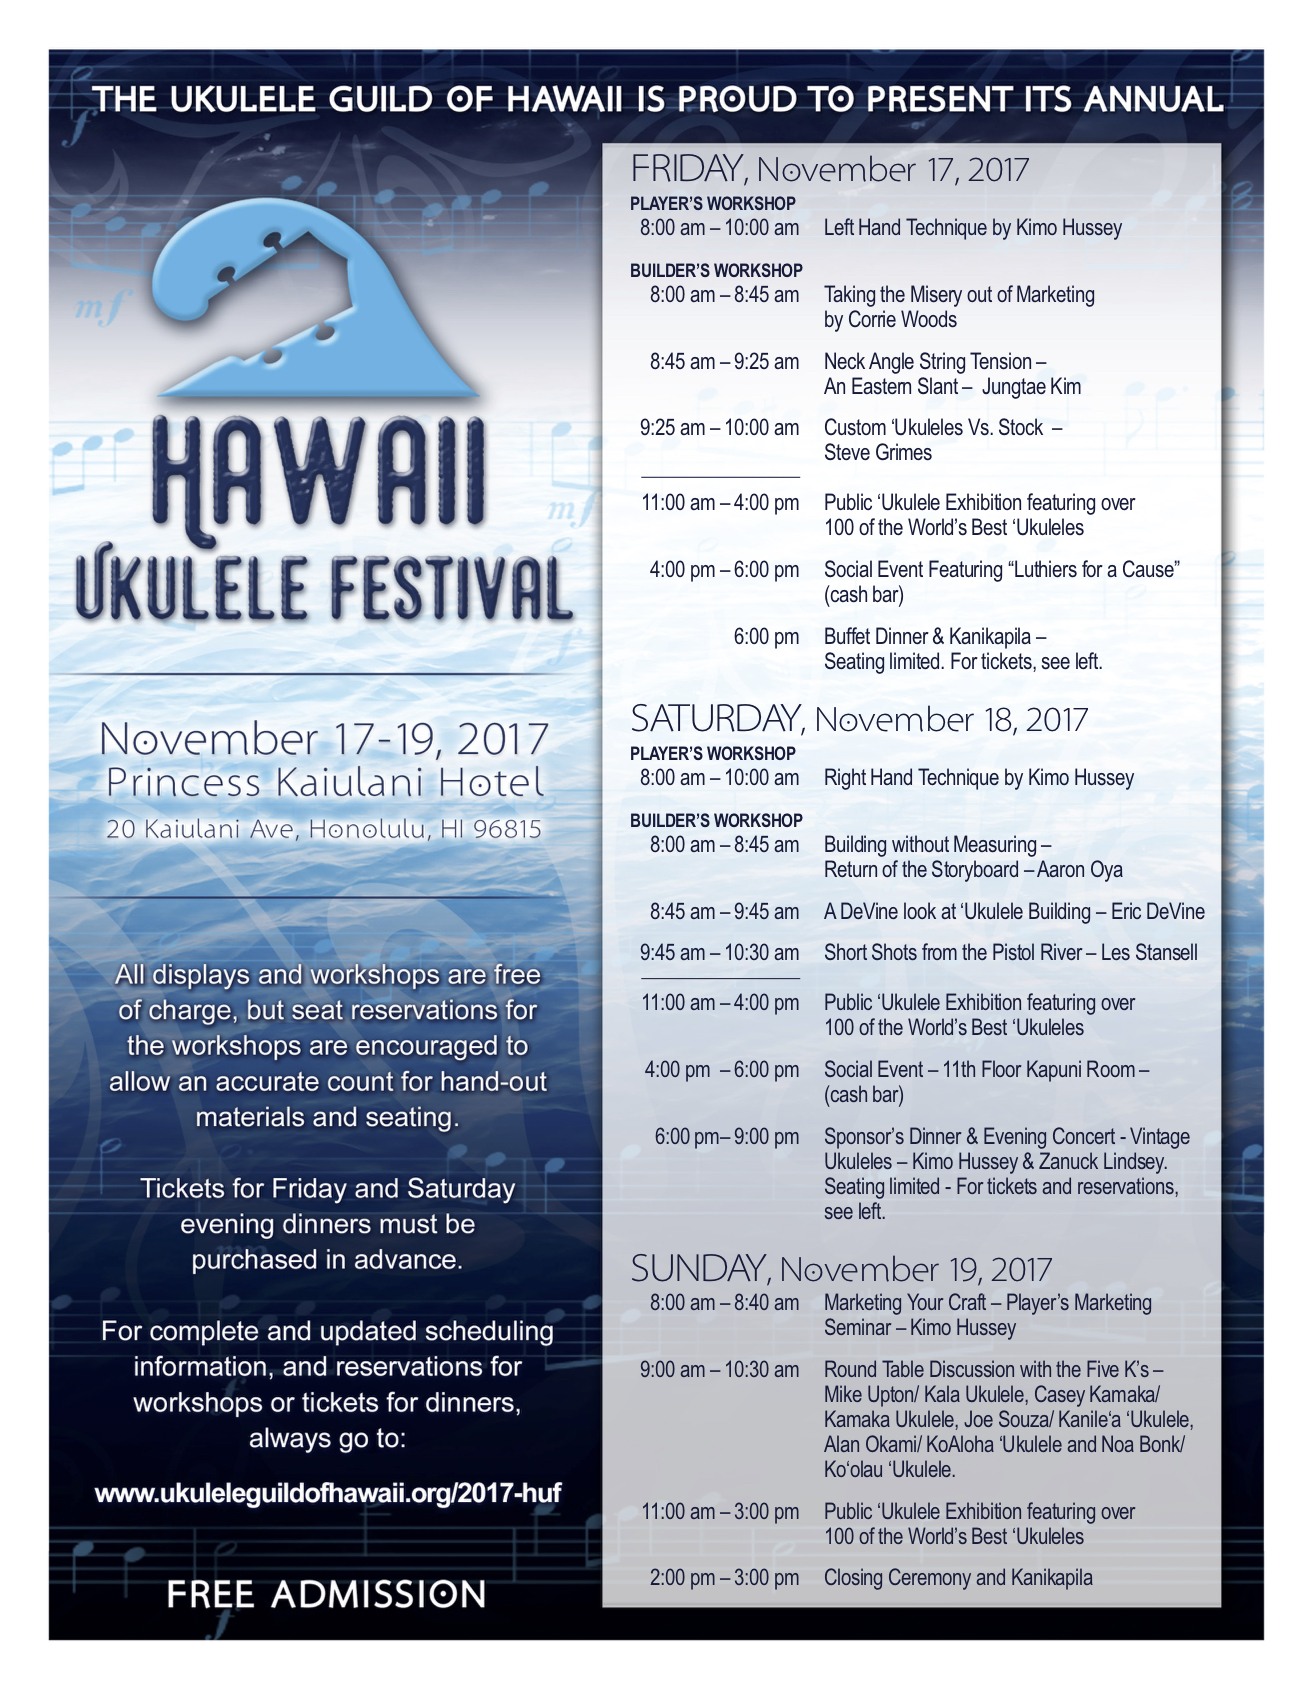 Hawaii Ukulele Festival